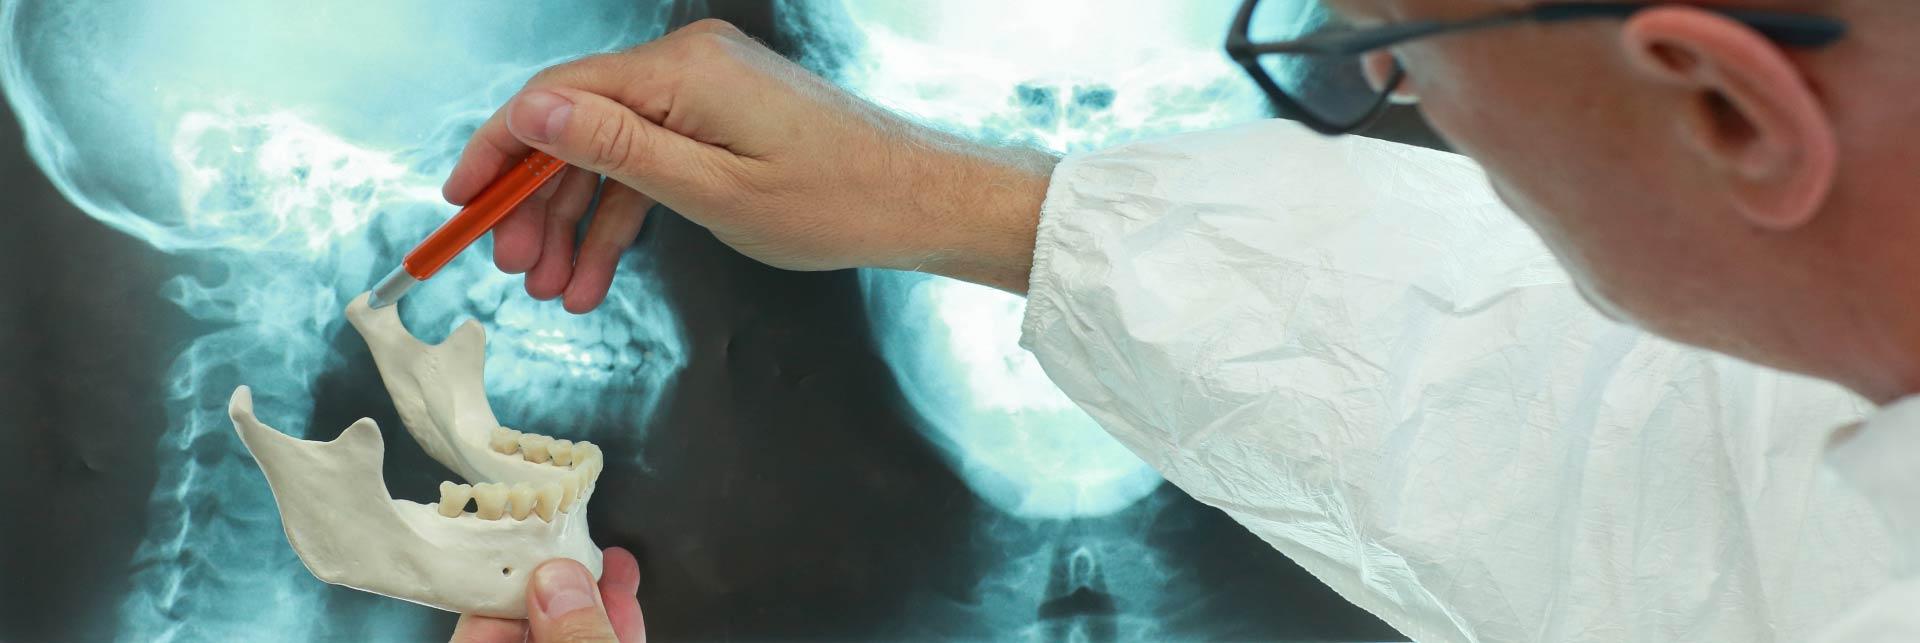 TMJ Surgery - Lanzi Burke Oral Surgery